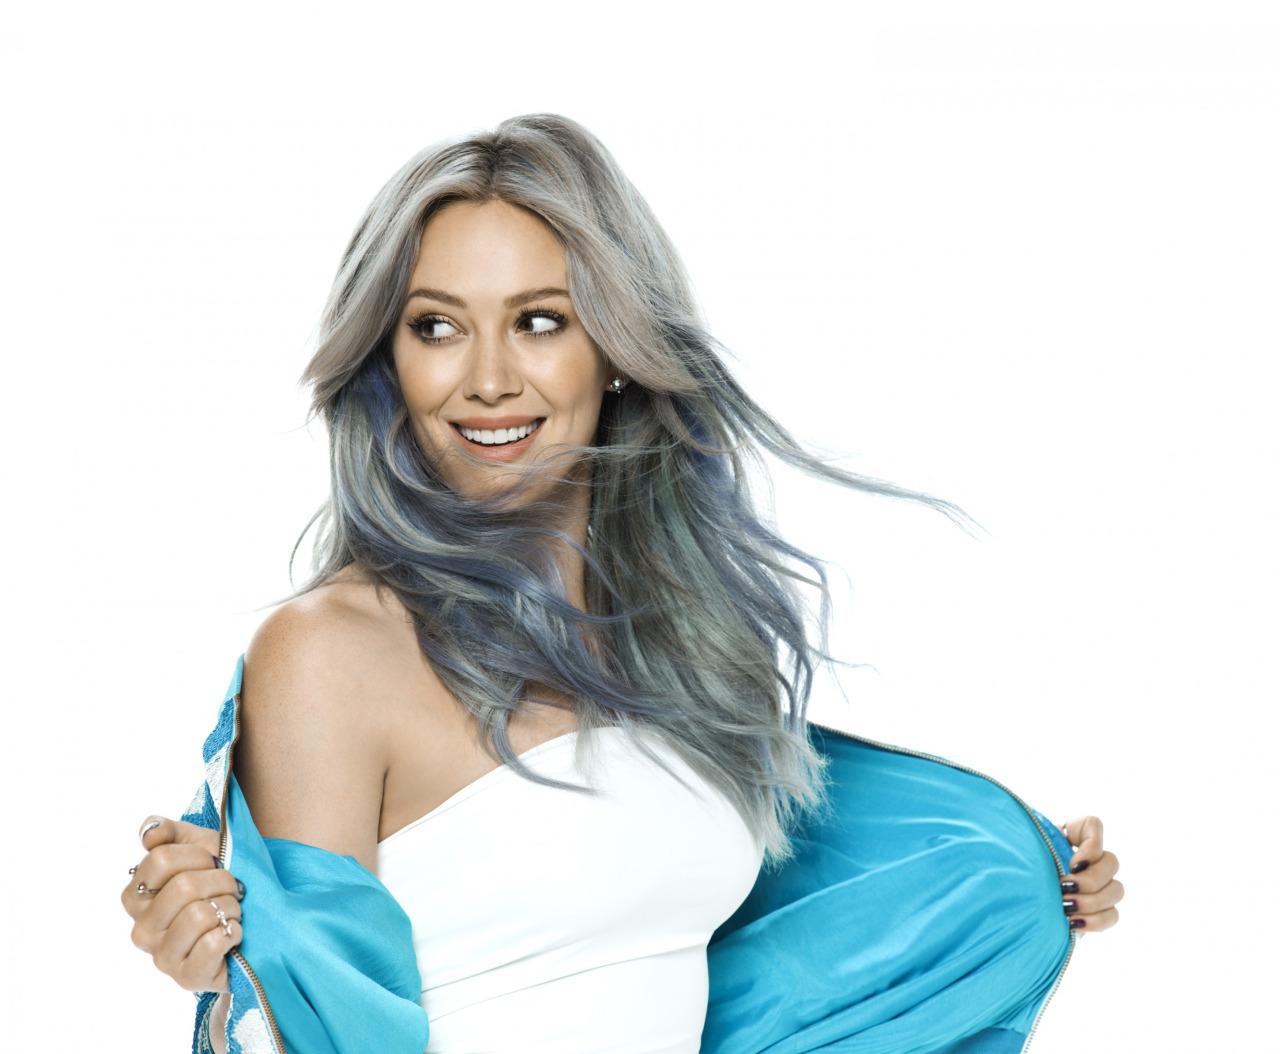 Best New Lyrics: Hilary Duff - My Kind (Lyrics) Hilary Duff Lyrics